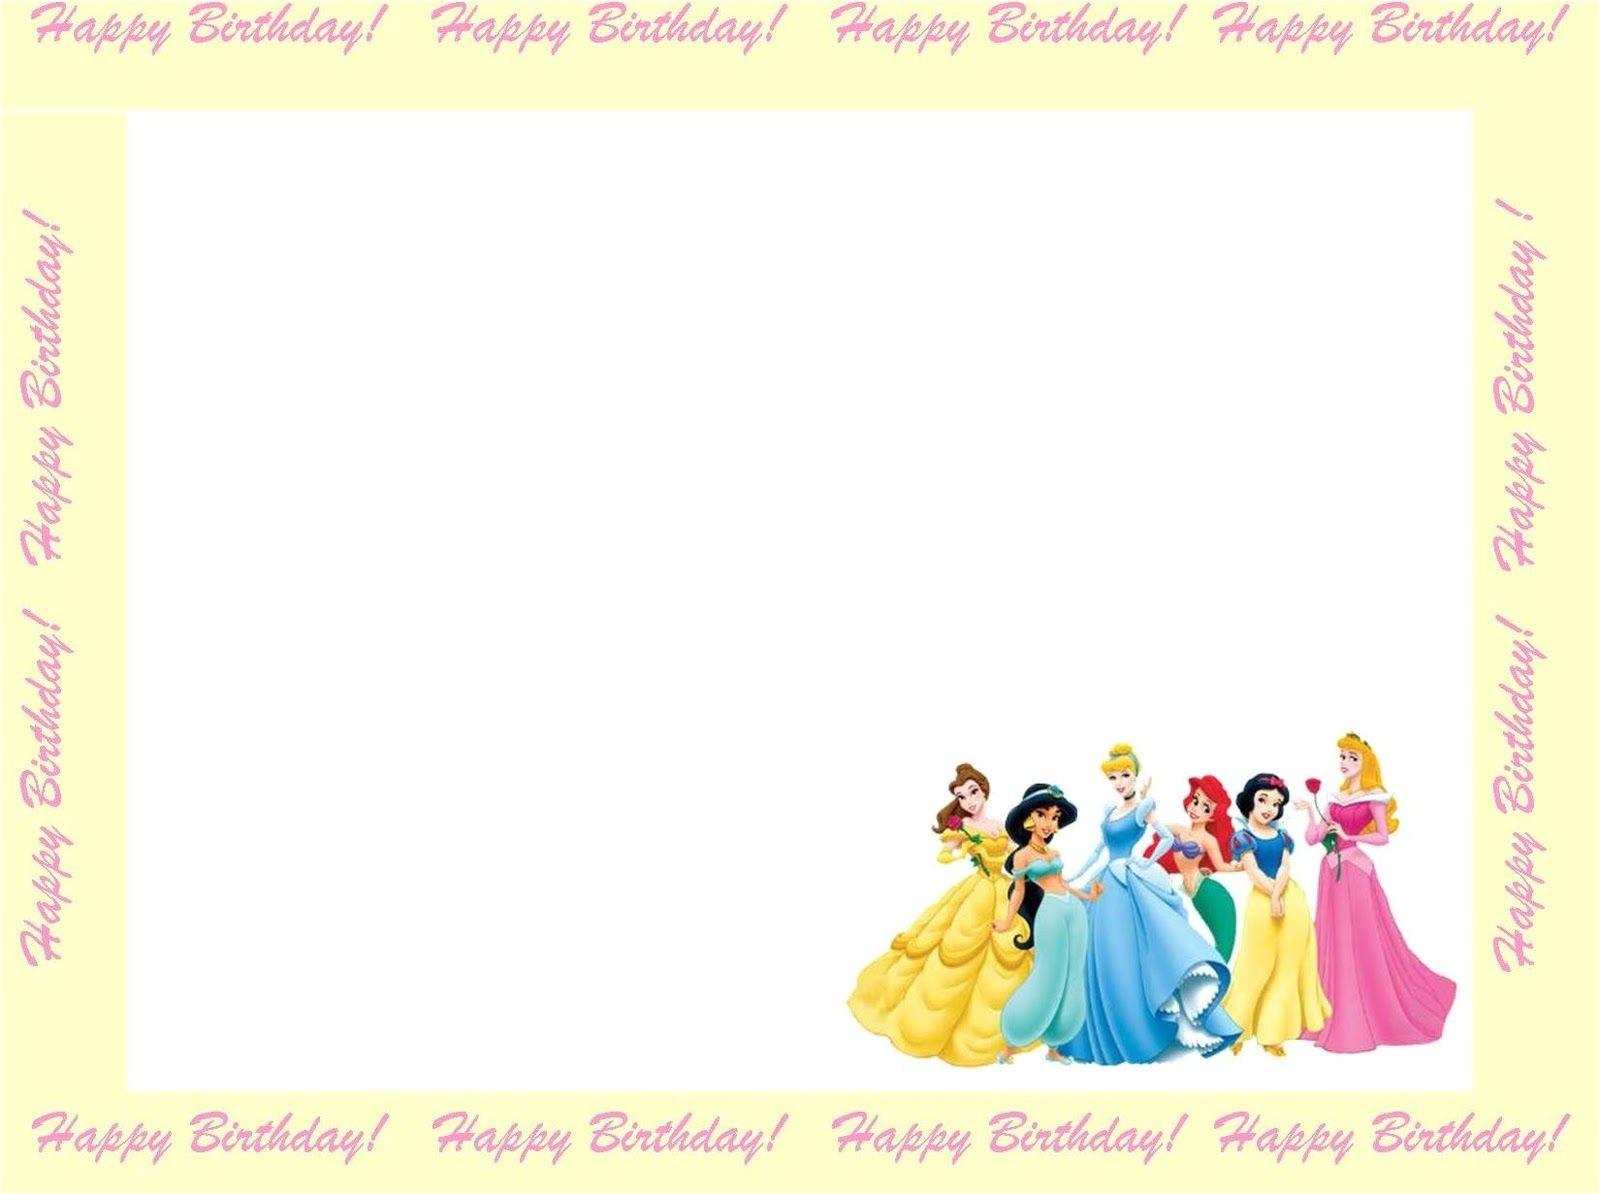 Disney Princess Birthday Invitation Templates Free 6 Free Borders for Birthday Invitations